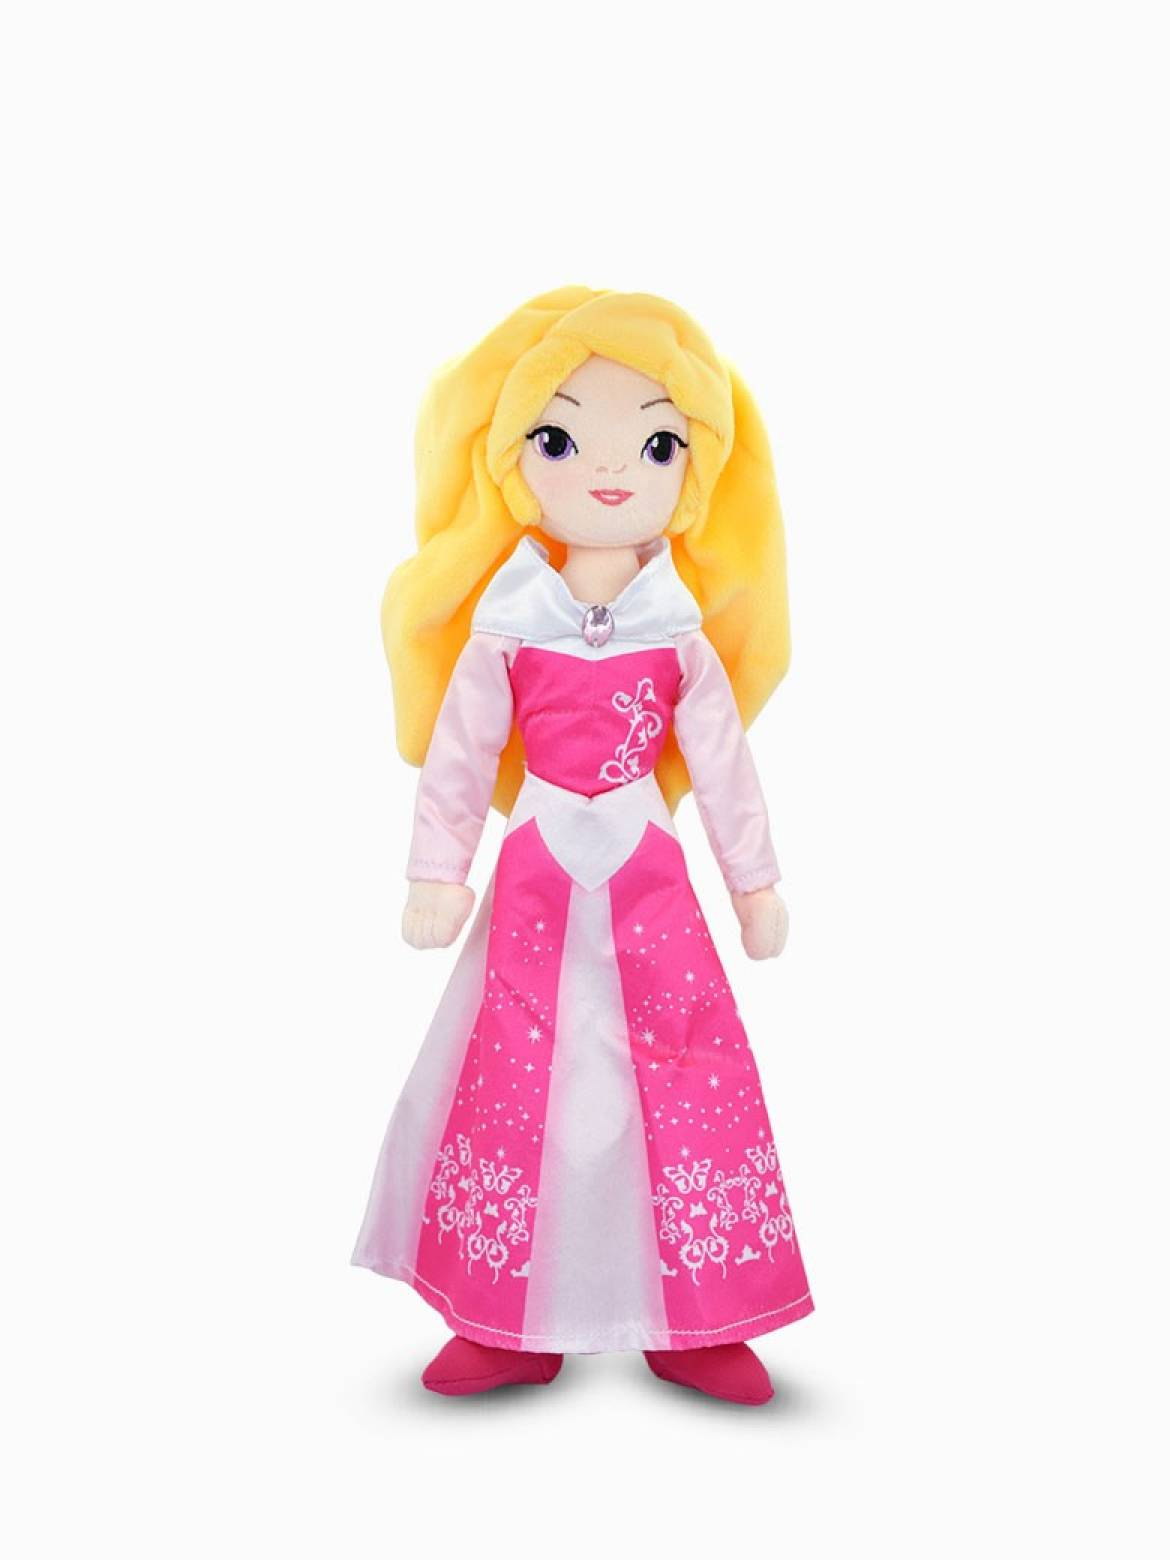 Disney Plush Princess Aurora 16 inch Boneka Karakter Original